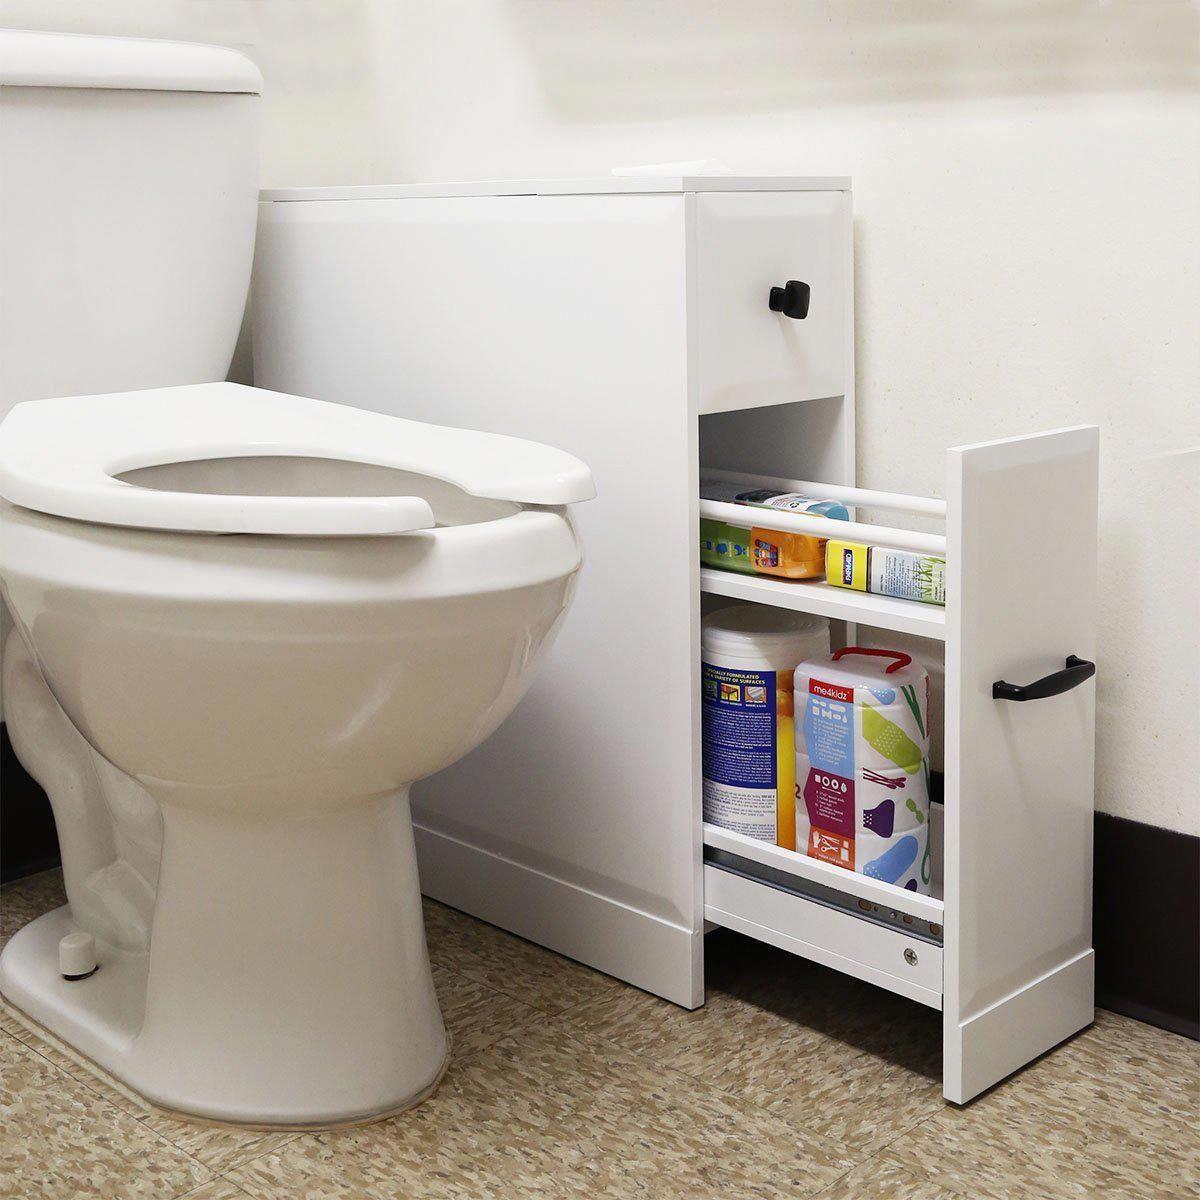 Free Standing Toilet Paper Holder Bathroom Cabinet Slideout Drawer Storage White Bathroom Floor Cabinets Bathroom Storage Bathroom Flooring